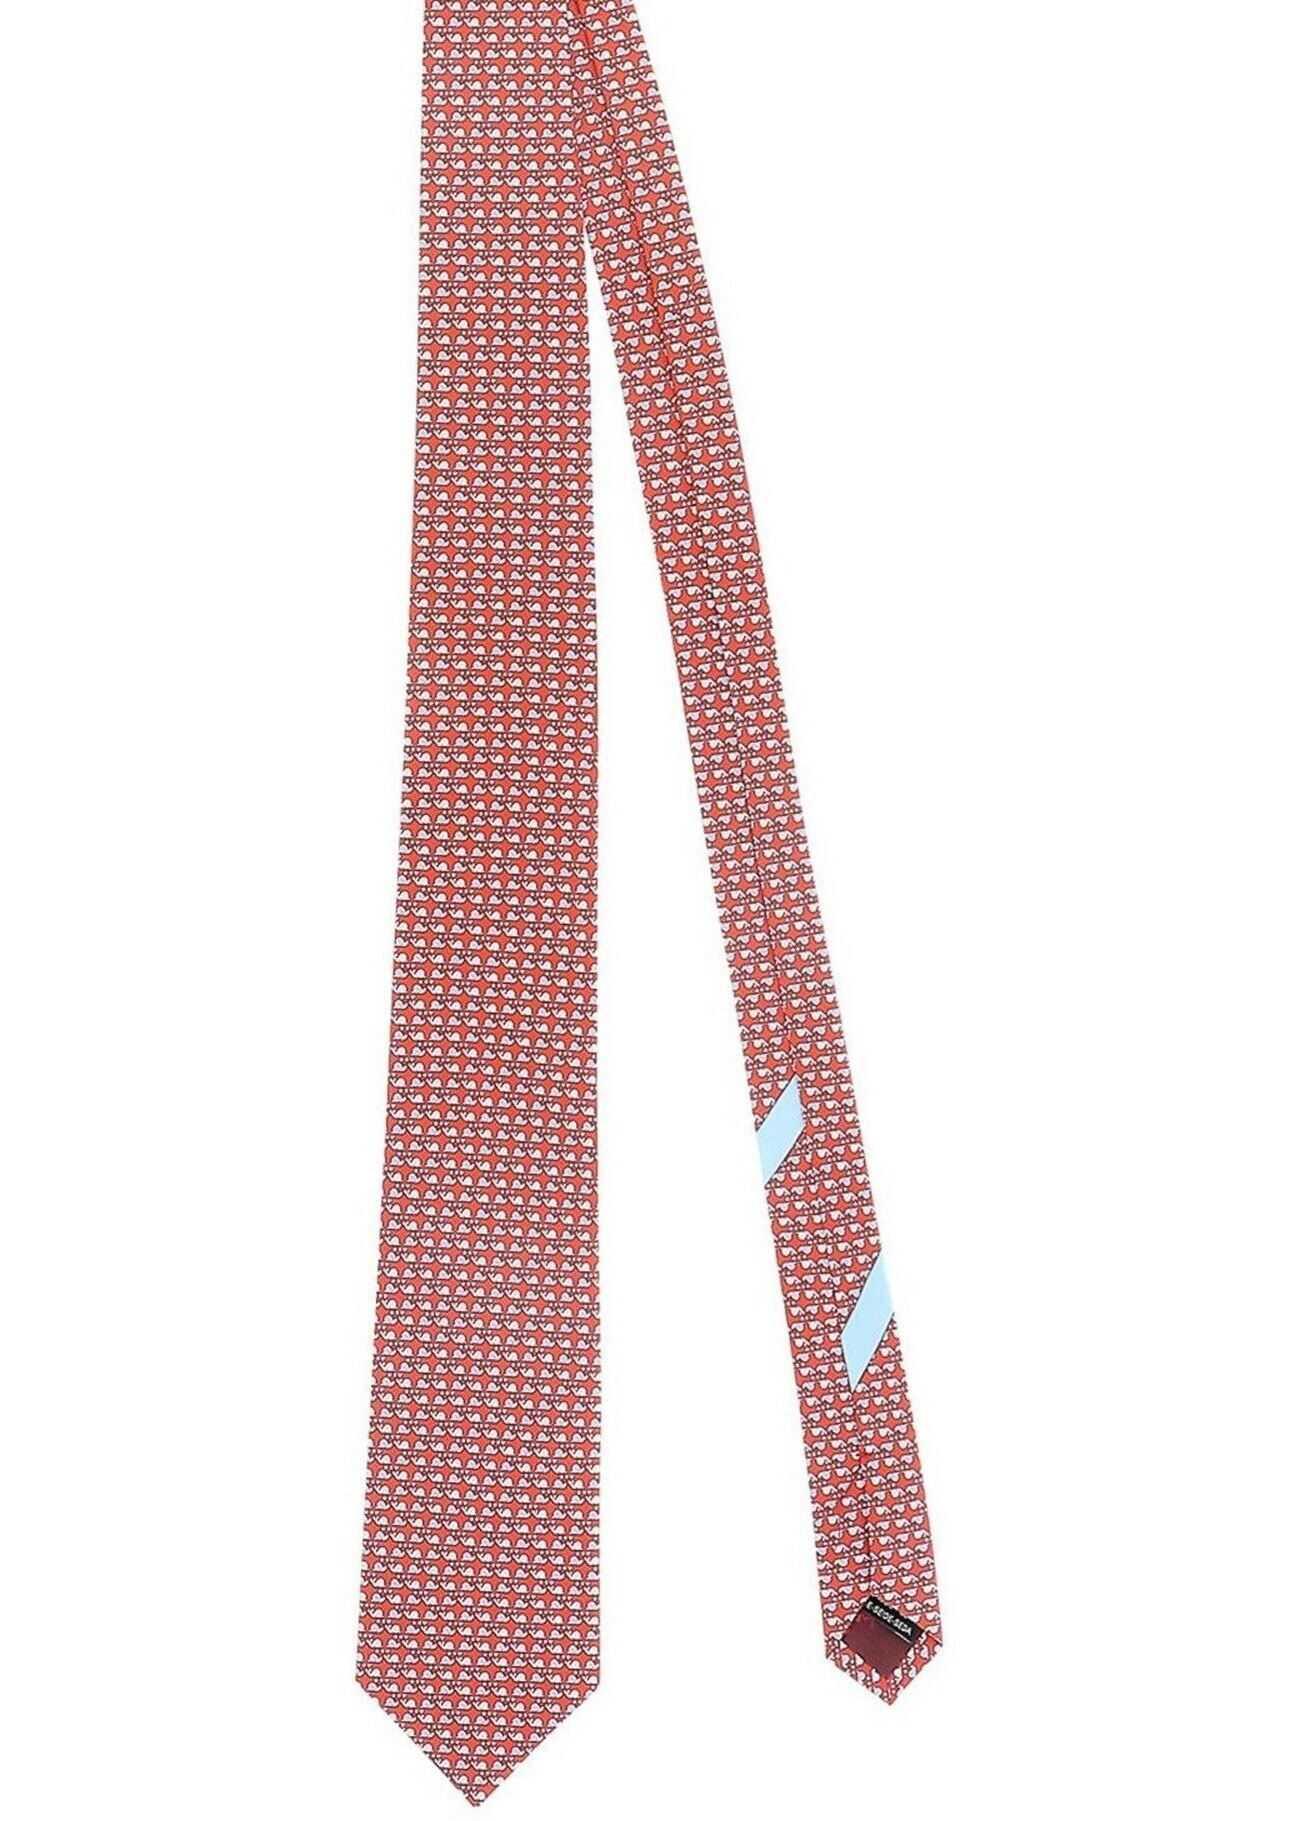 Salvatore Ferragamo Snail Printed Tie In Red Red